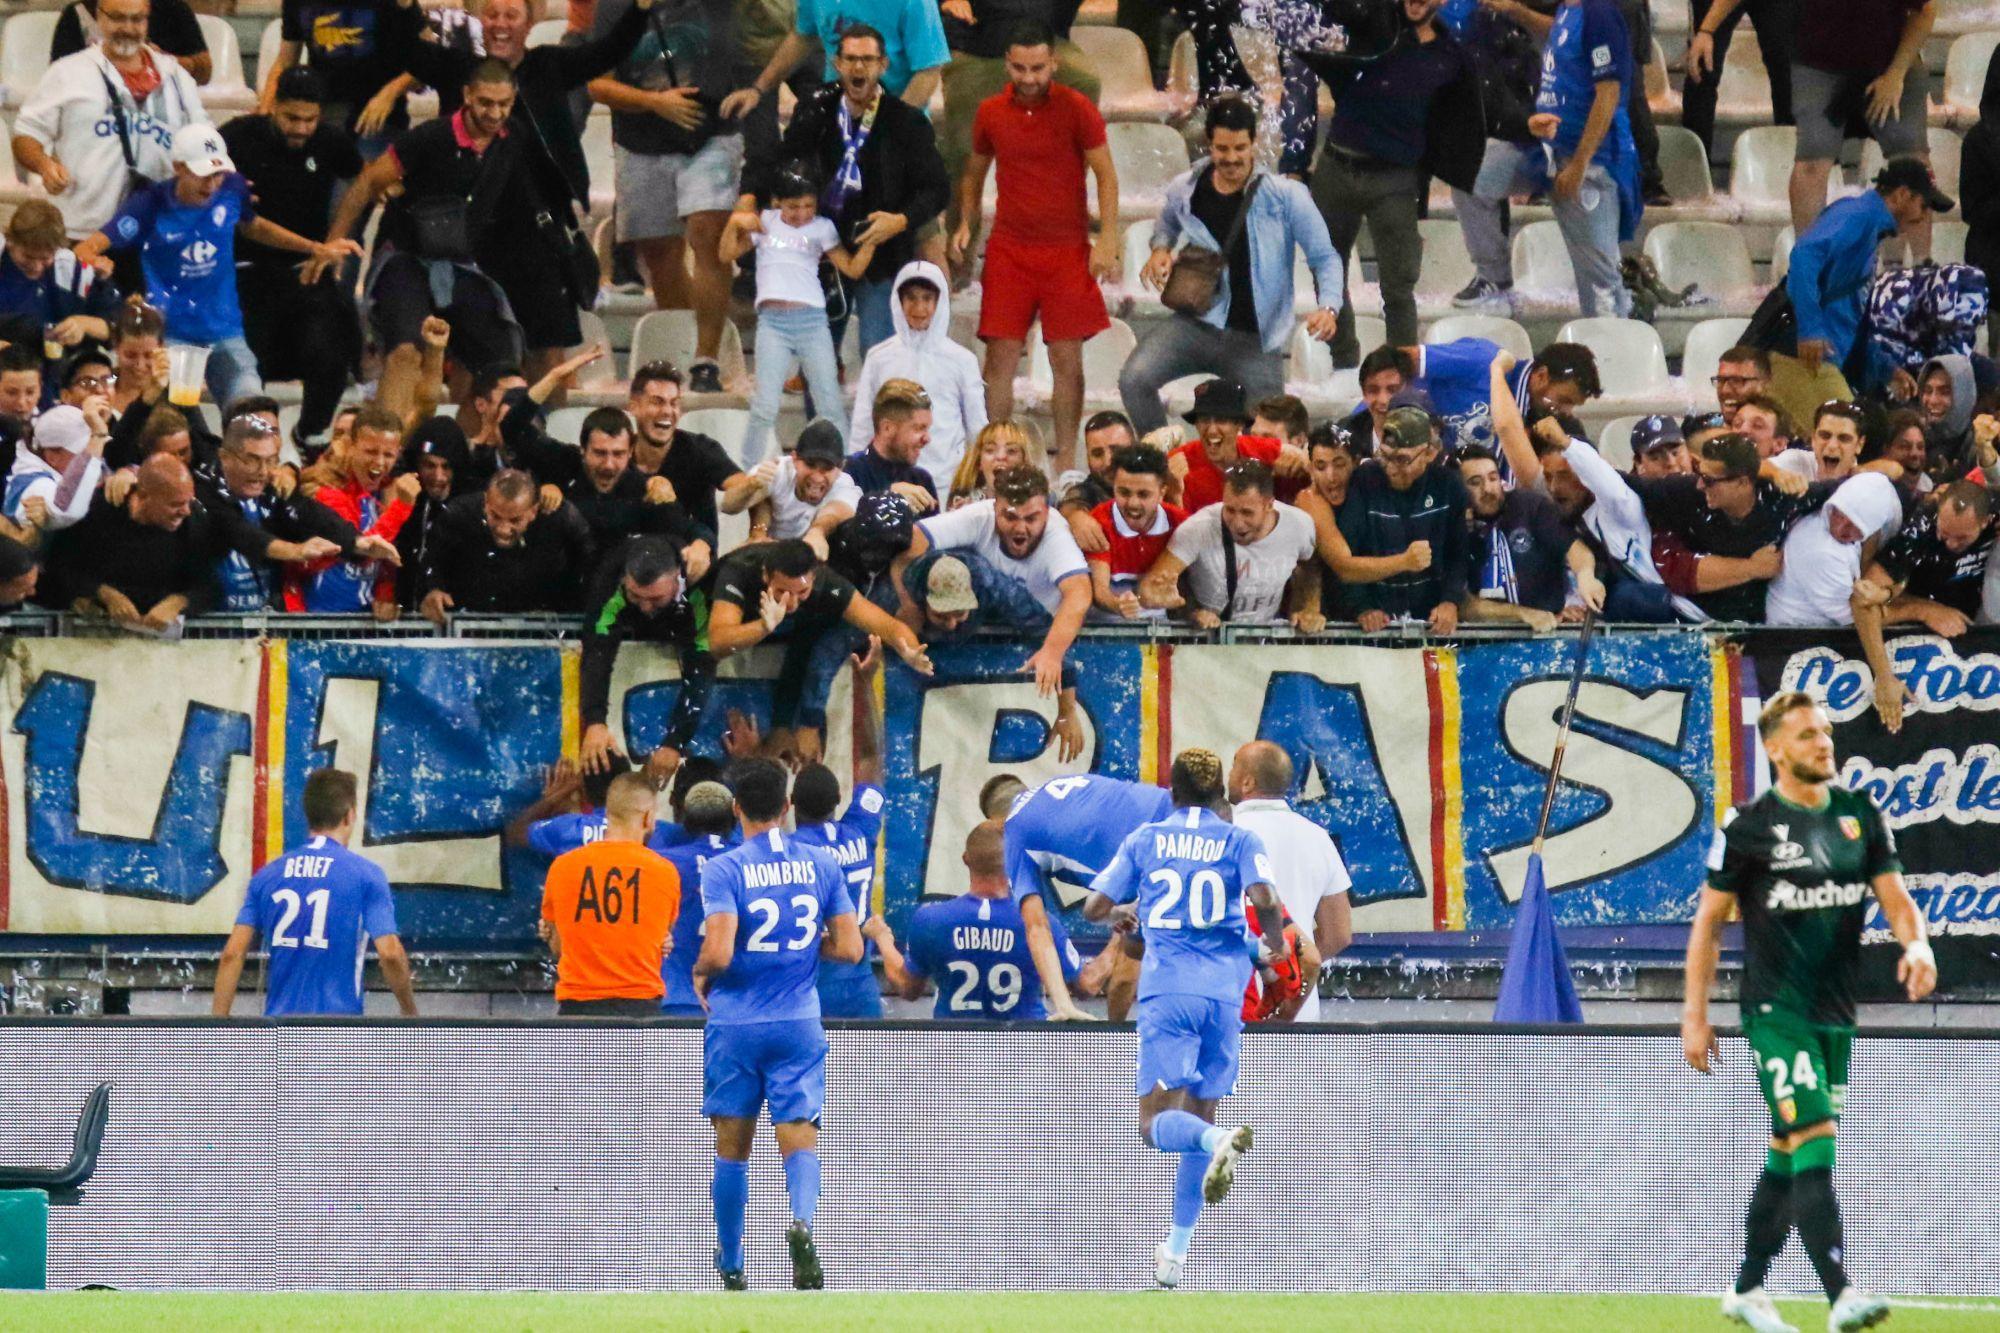 La banderole peu accueillante des supporters grenoblois avant le match contre Caen